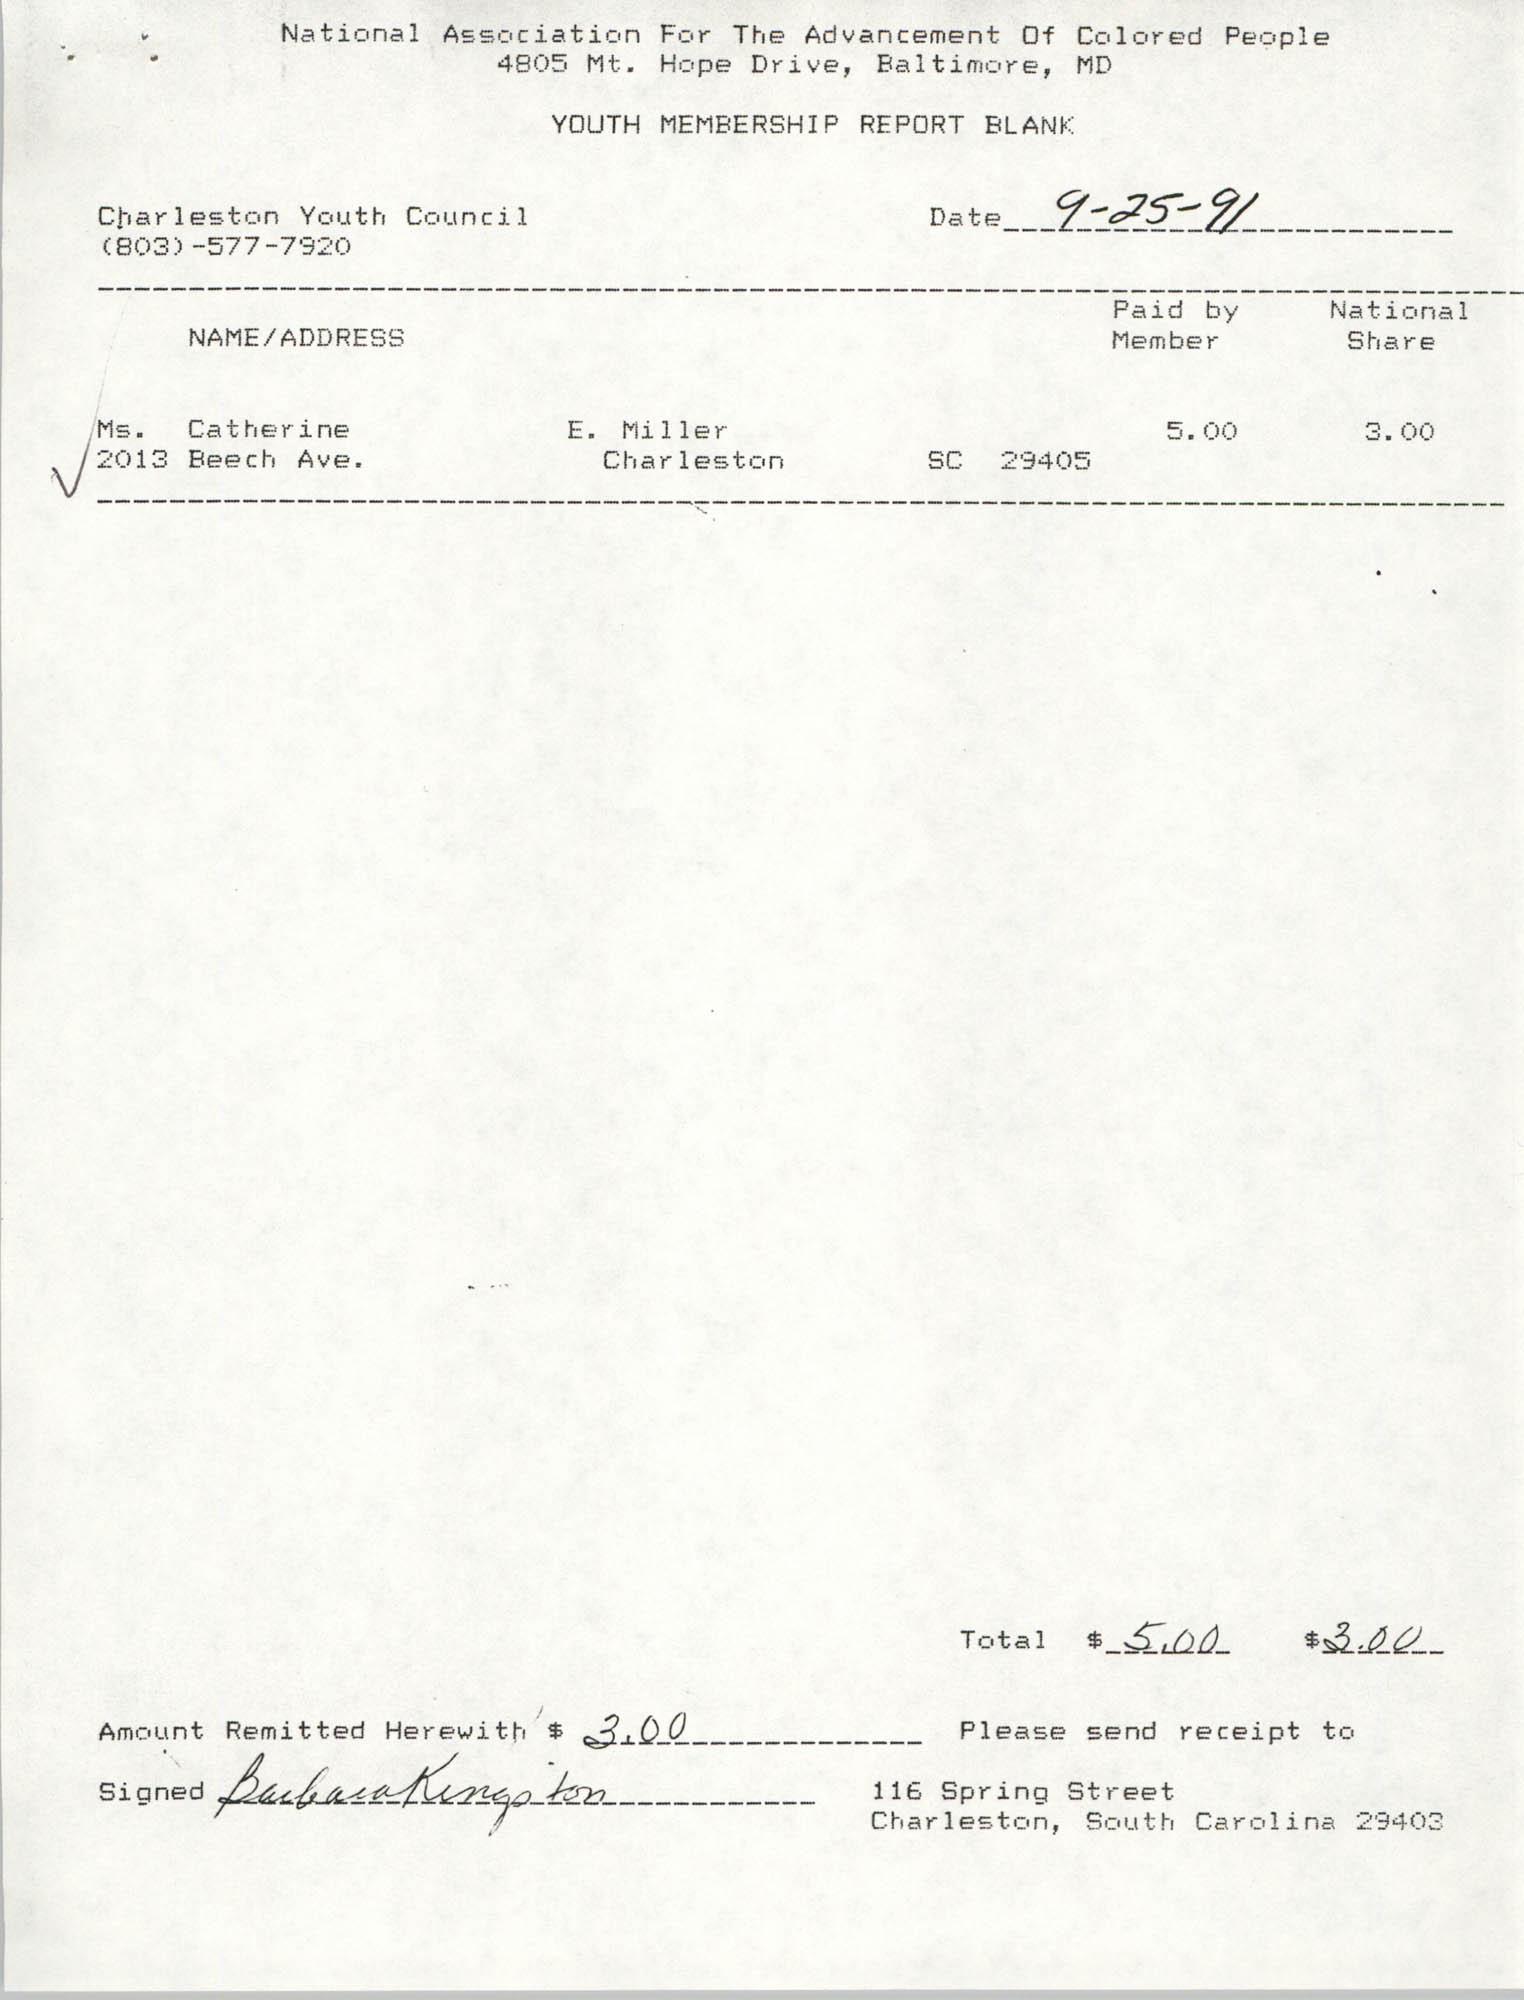 Youth Membership Report Blank, Charleston Youth Council, NAACP, Barbara Kingston, September 25, 1991